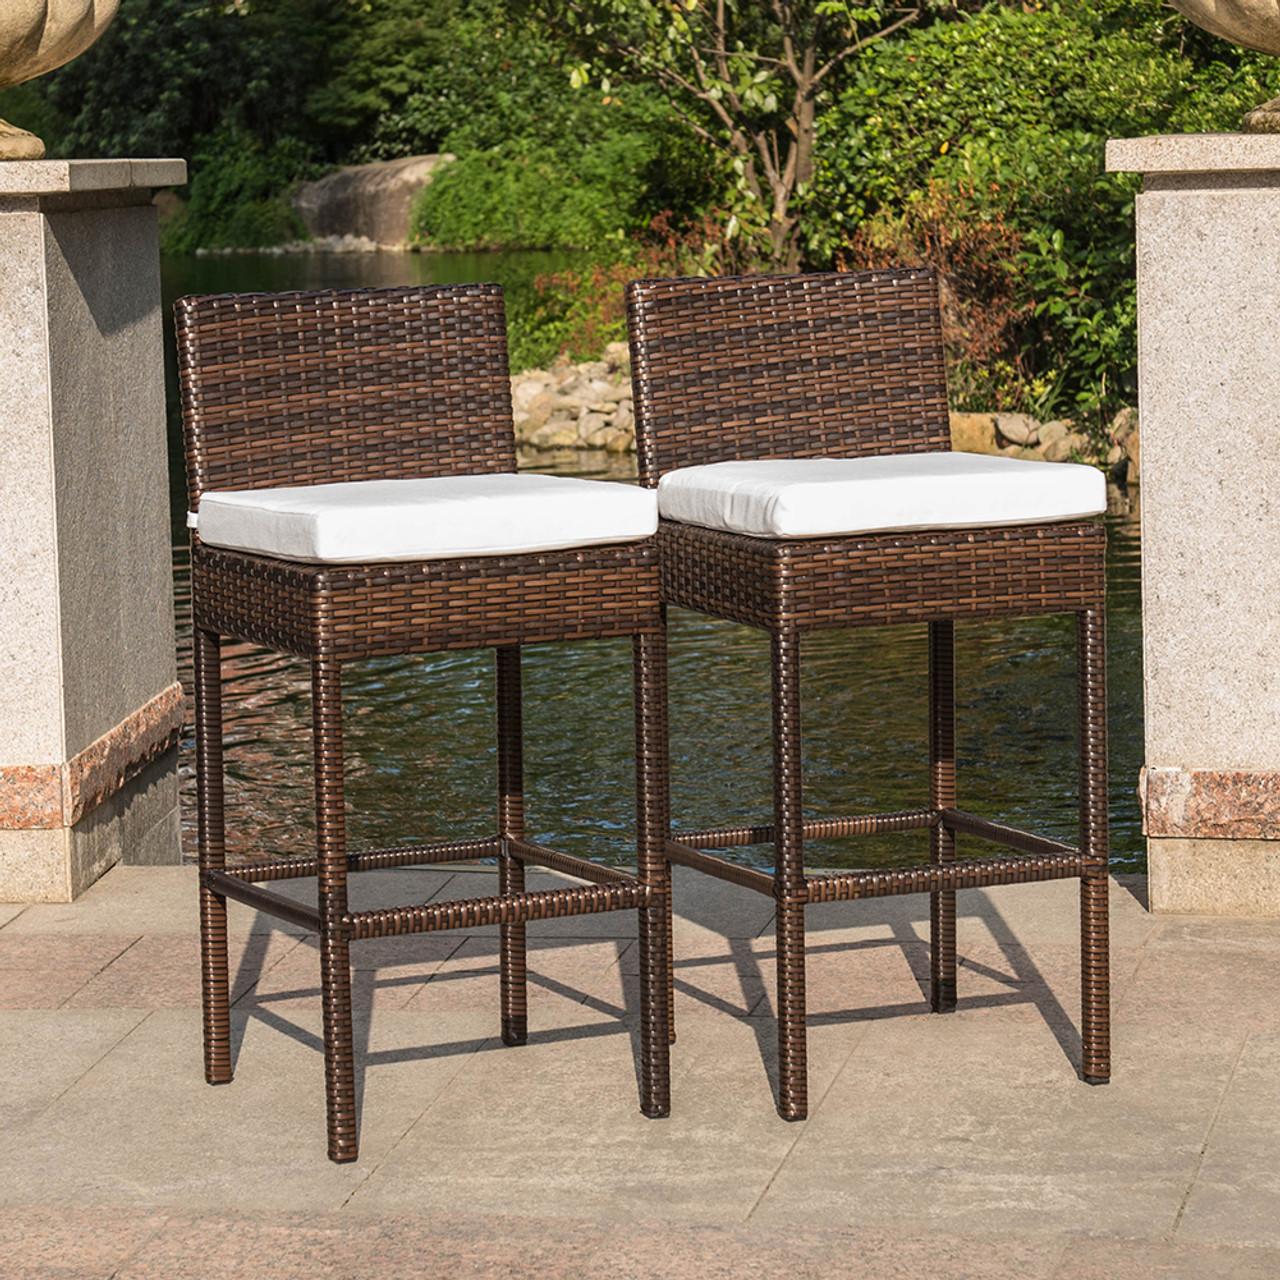 Outdoor Furniture Wicker Furniture SUNDALE OUTDOOR - Wicker furniture outdoor